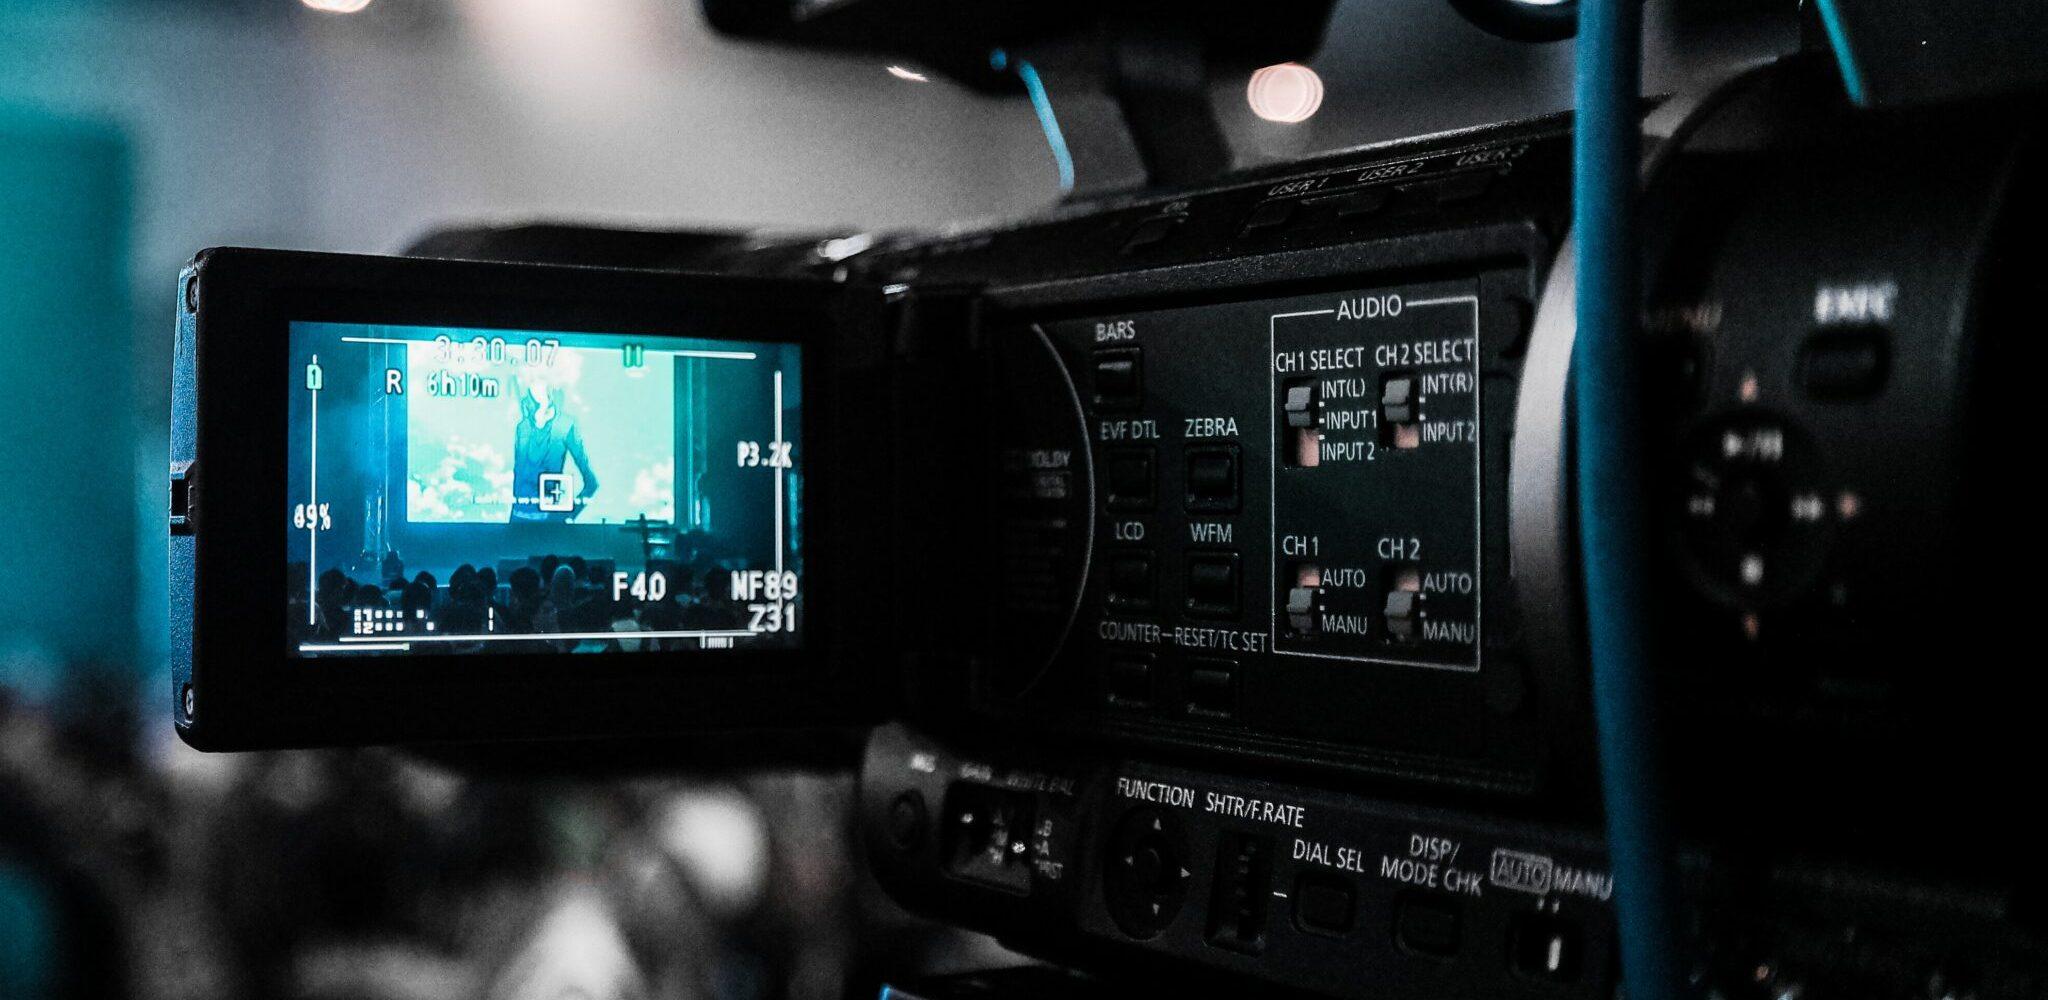 camera-event-live-settings-66134